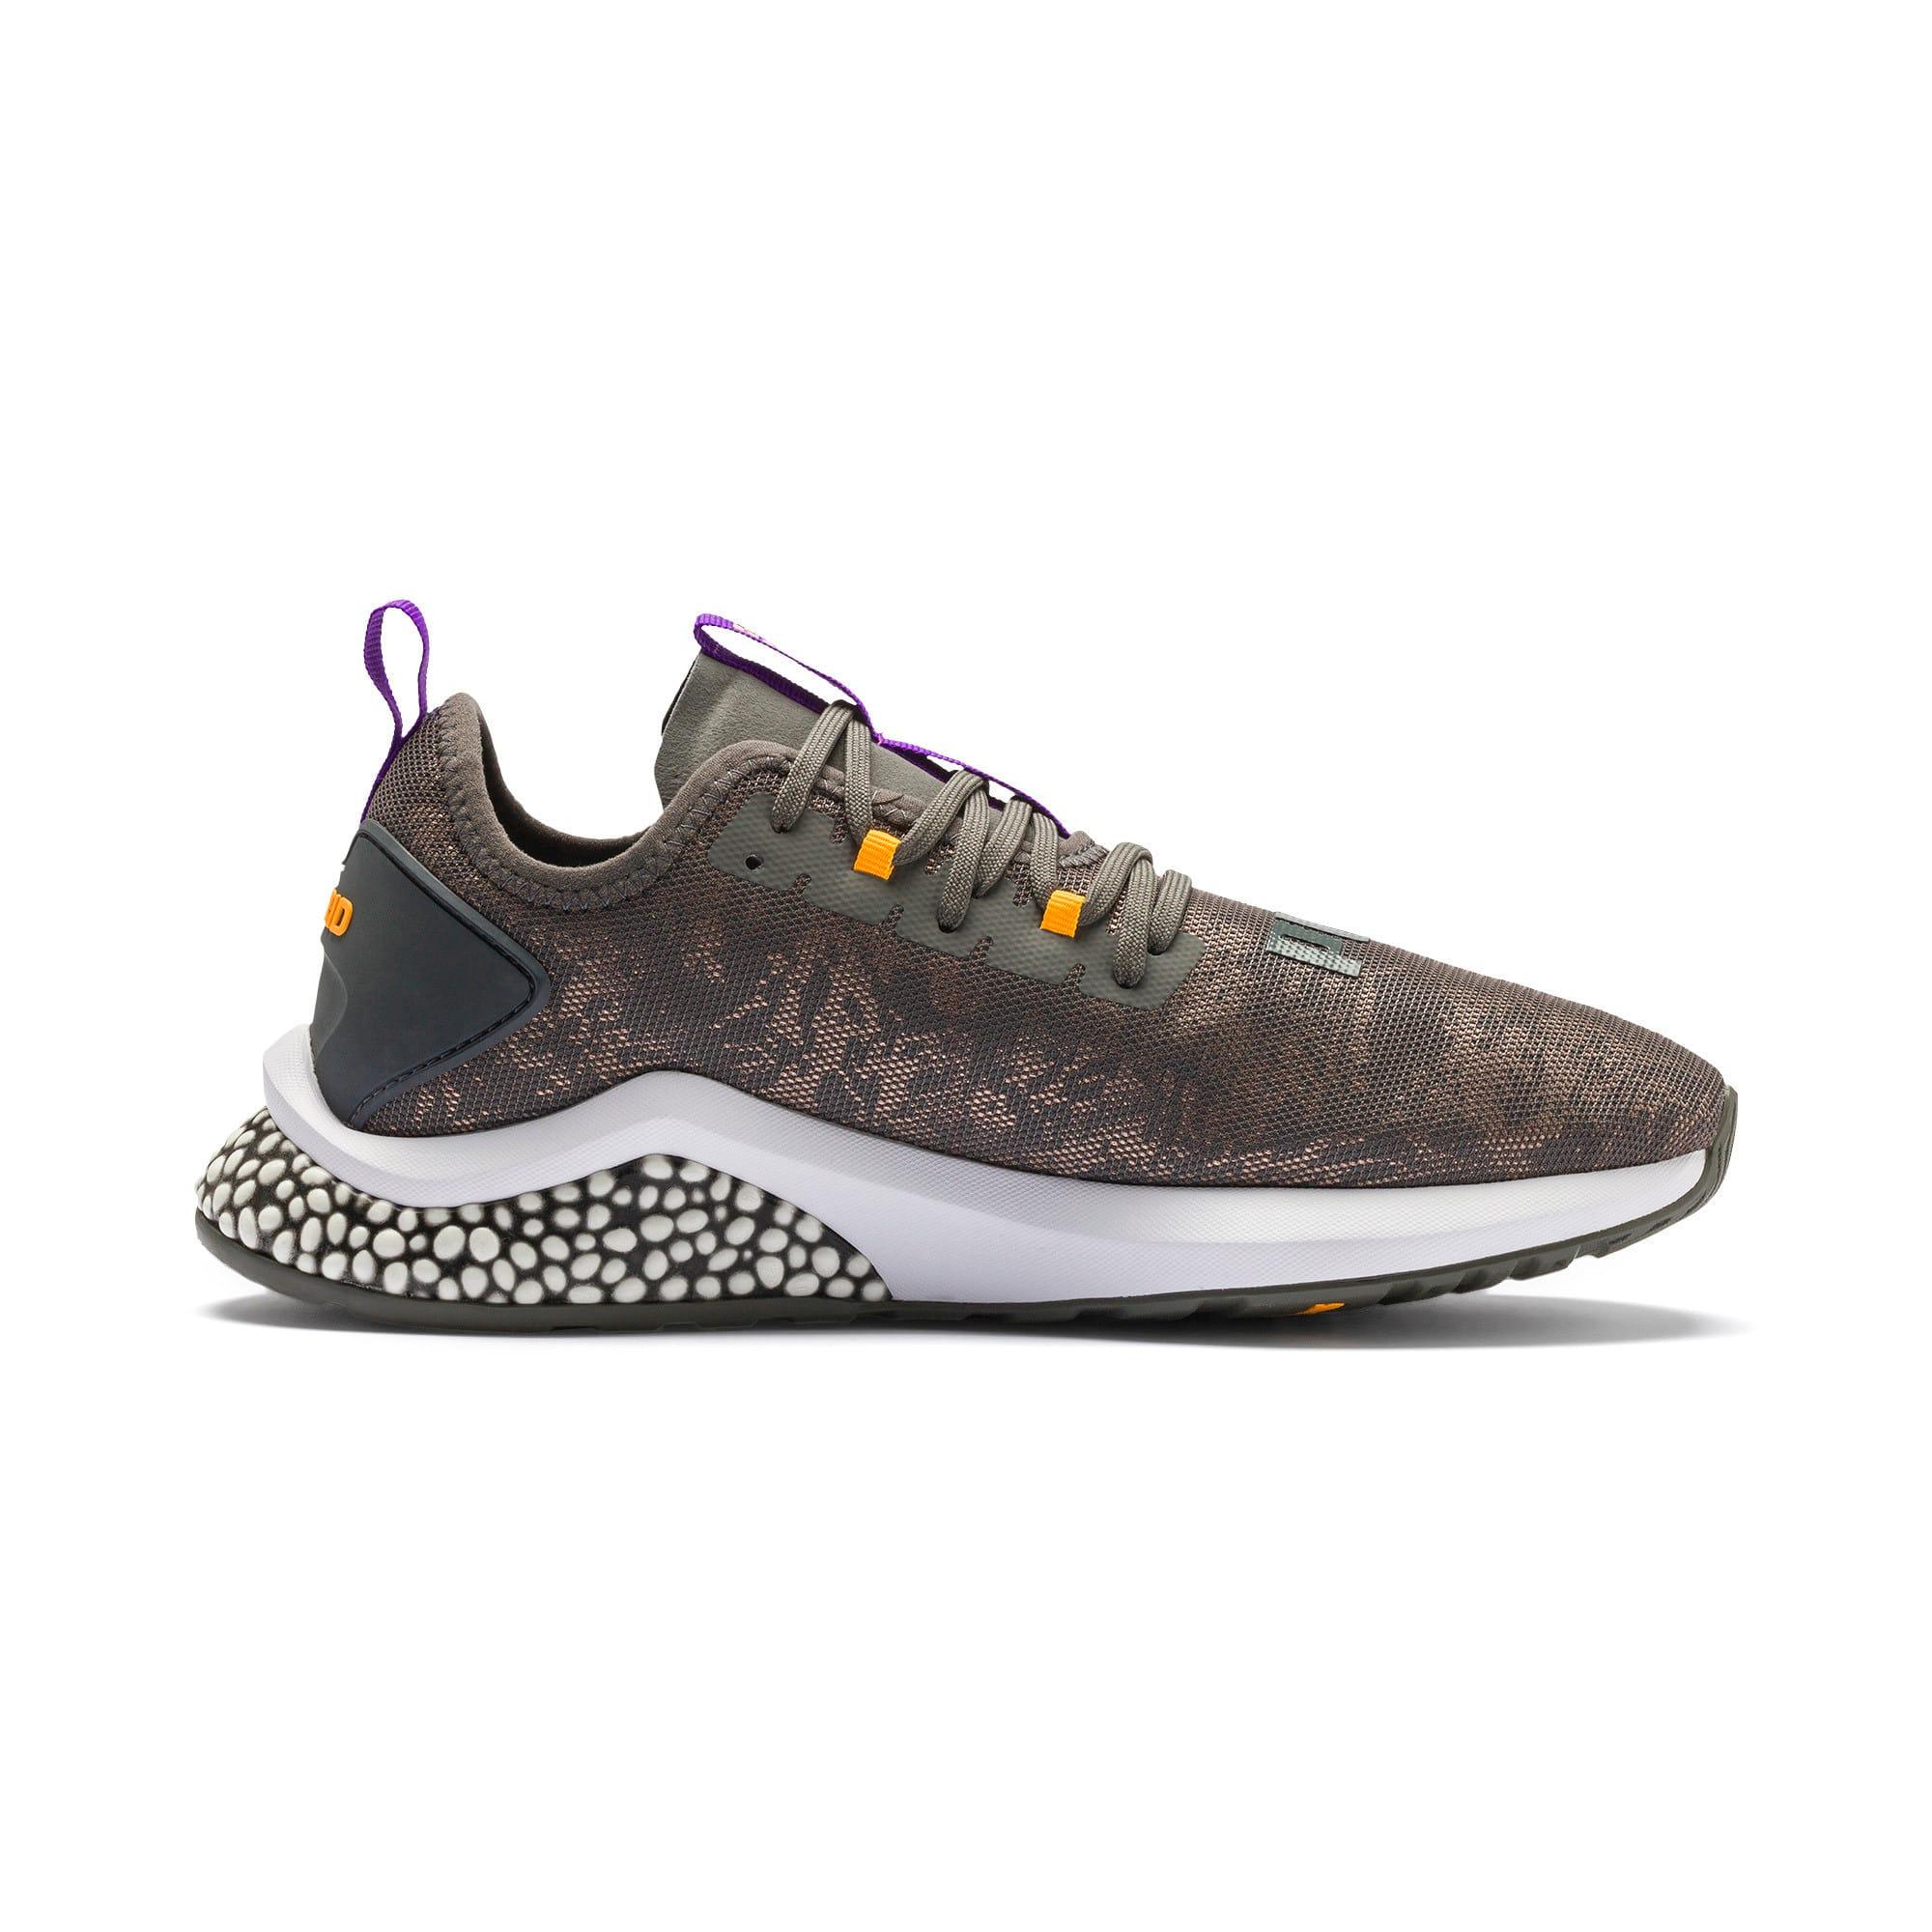 Thumbnail 6 of HYBRID NX Rave Men's Running Shoes, CASTLEROCK-Purple-Orange, medium